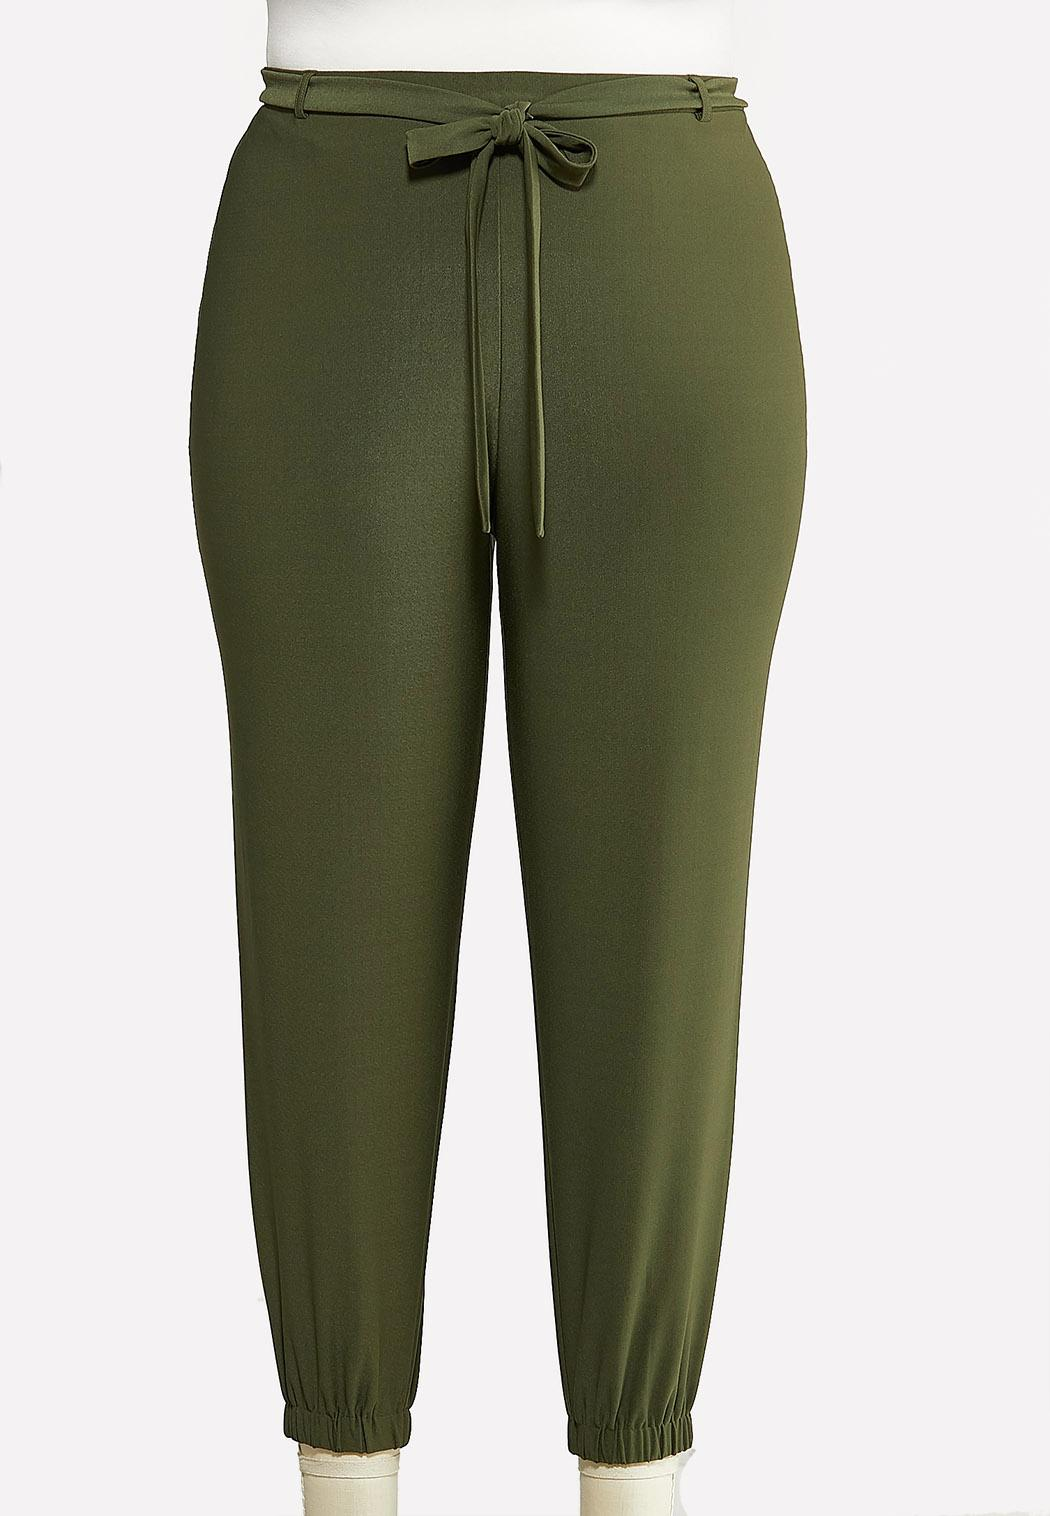 Plus Size Olive Dressy Joggers